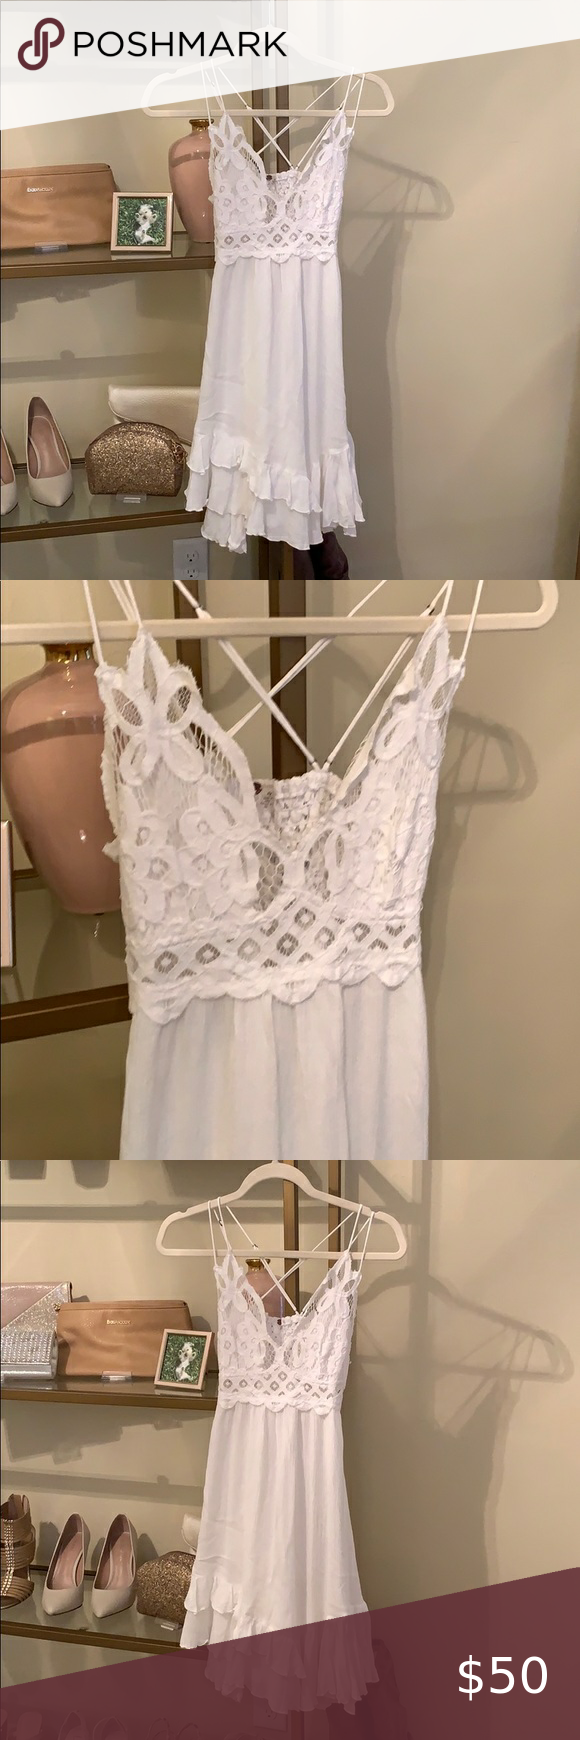 Free People White Slip Dress White Slip Dress Slip Dress Dresses [ 1740 x 580 Pixel ]